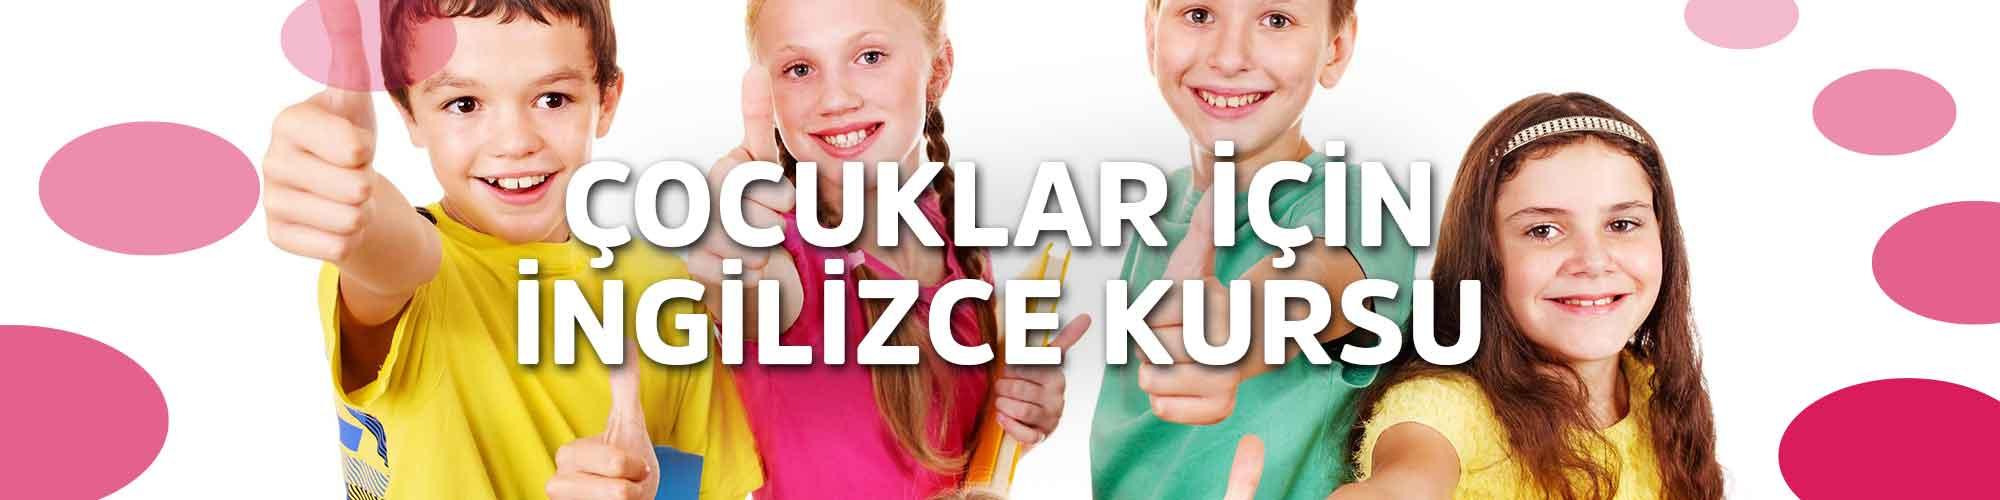 COCUKLAR_ICIN_INGILIZCE_KURSU